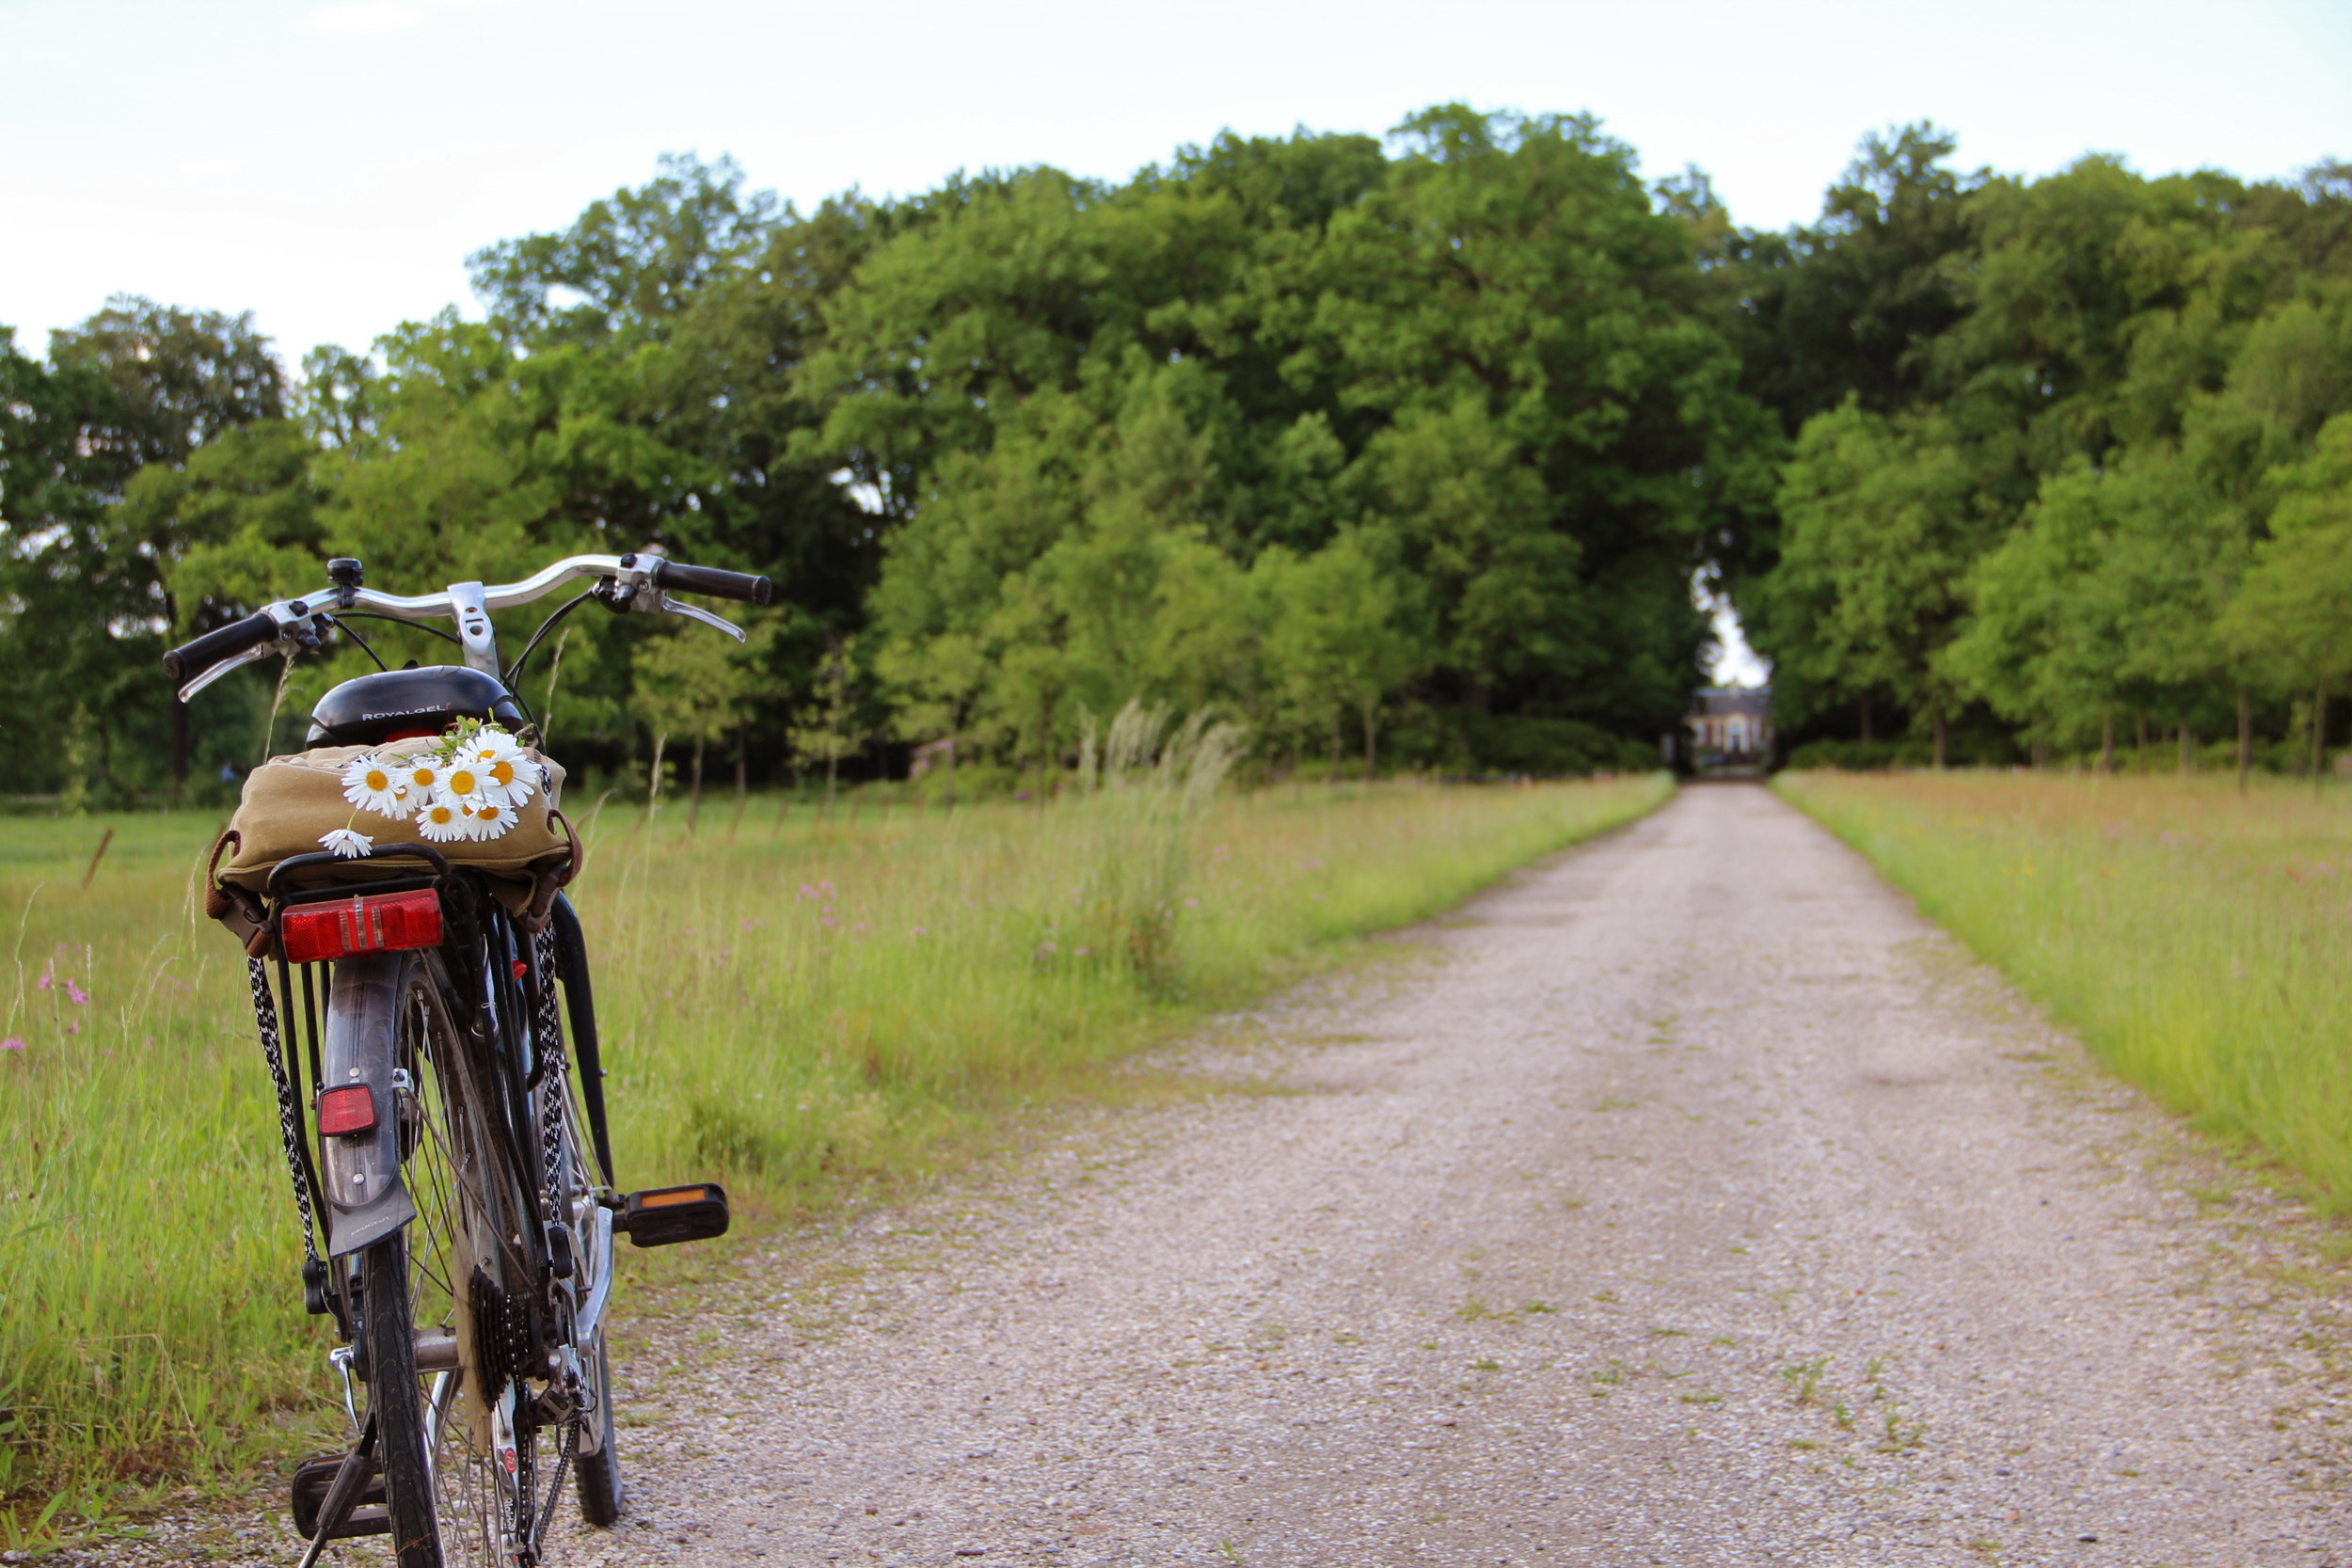 DeWiersse bike image